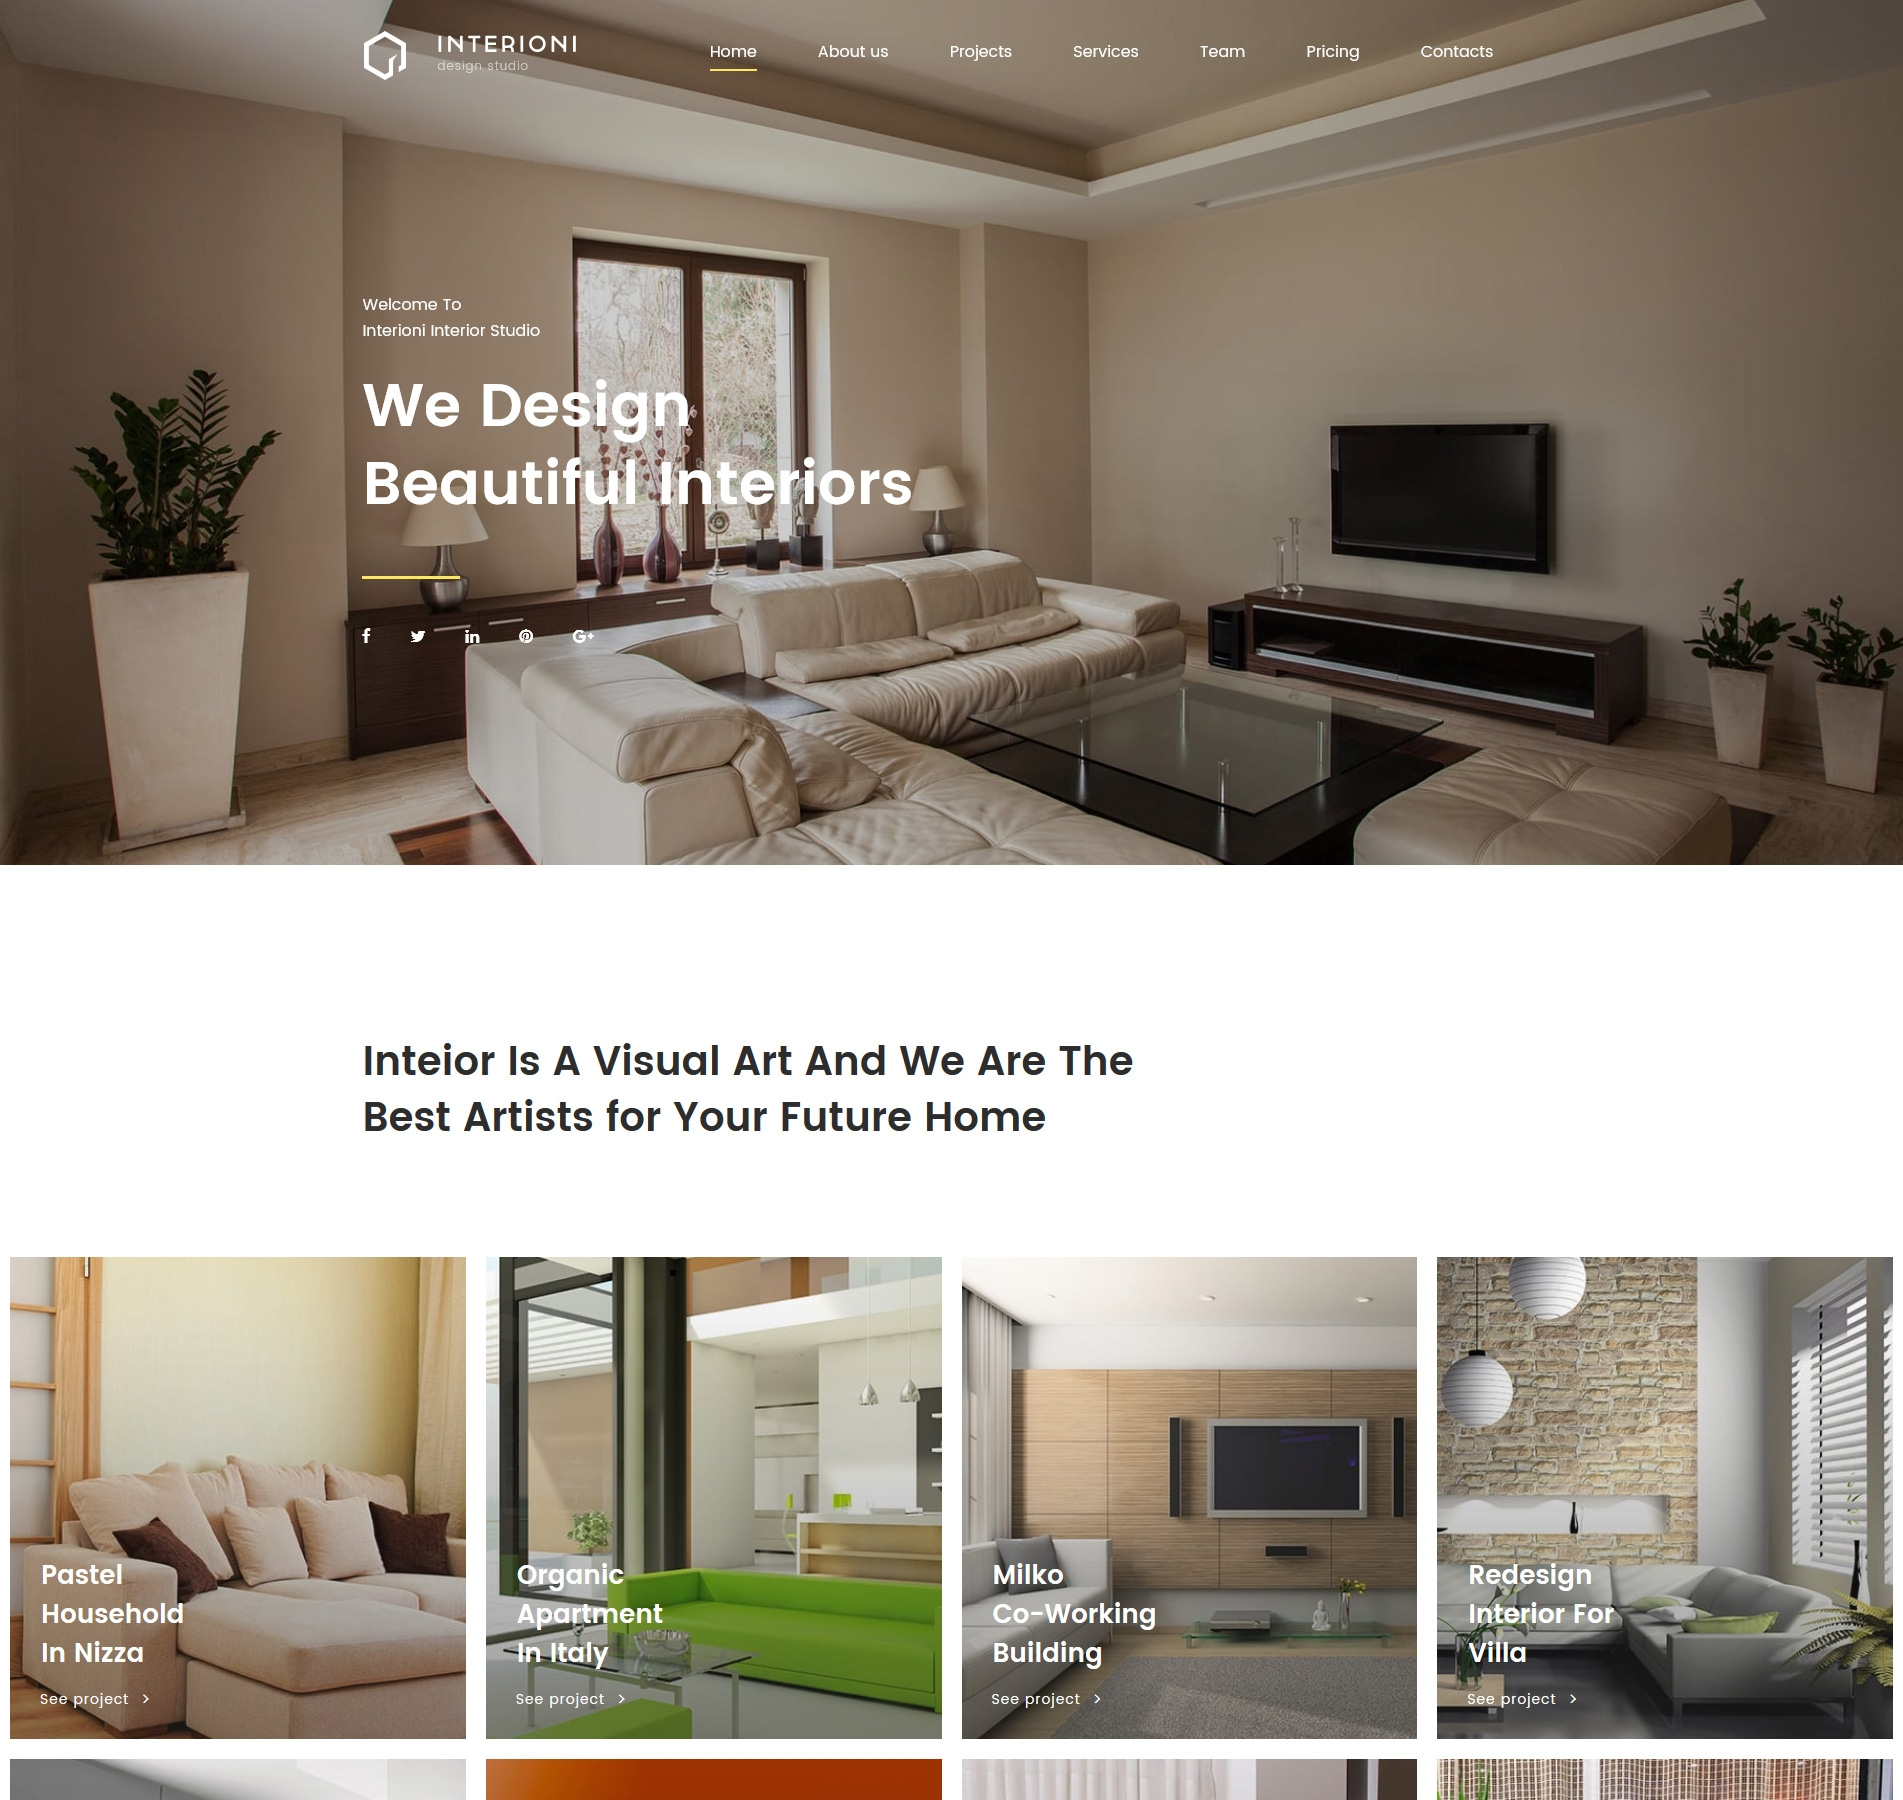 Home Decor Website Design Interioni